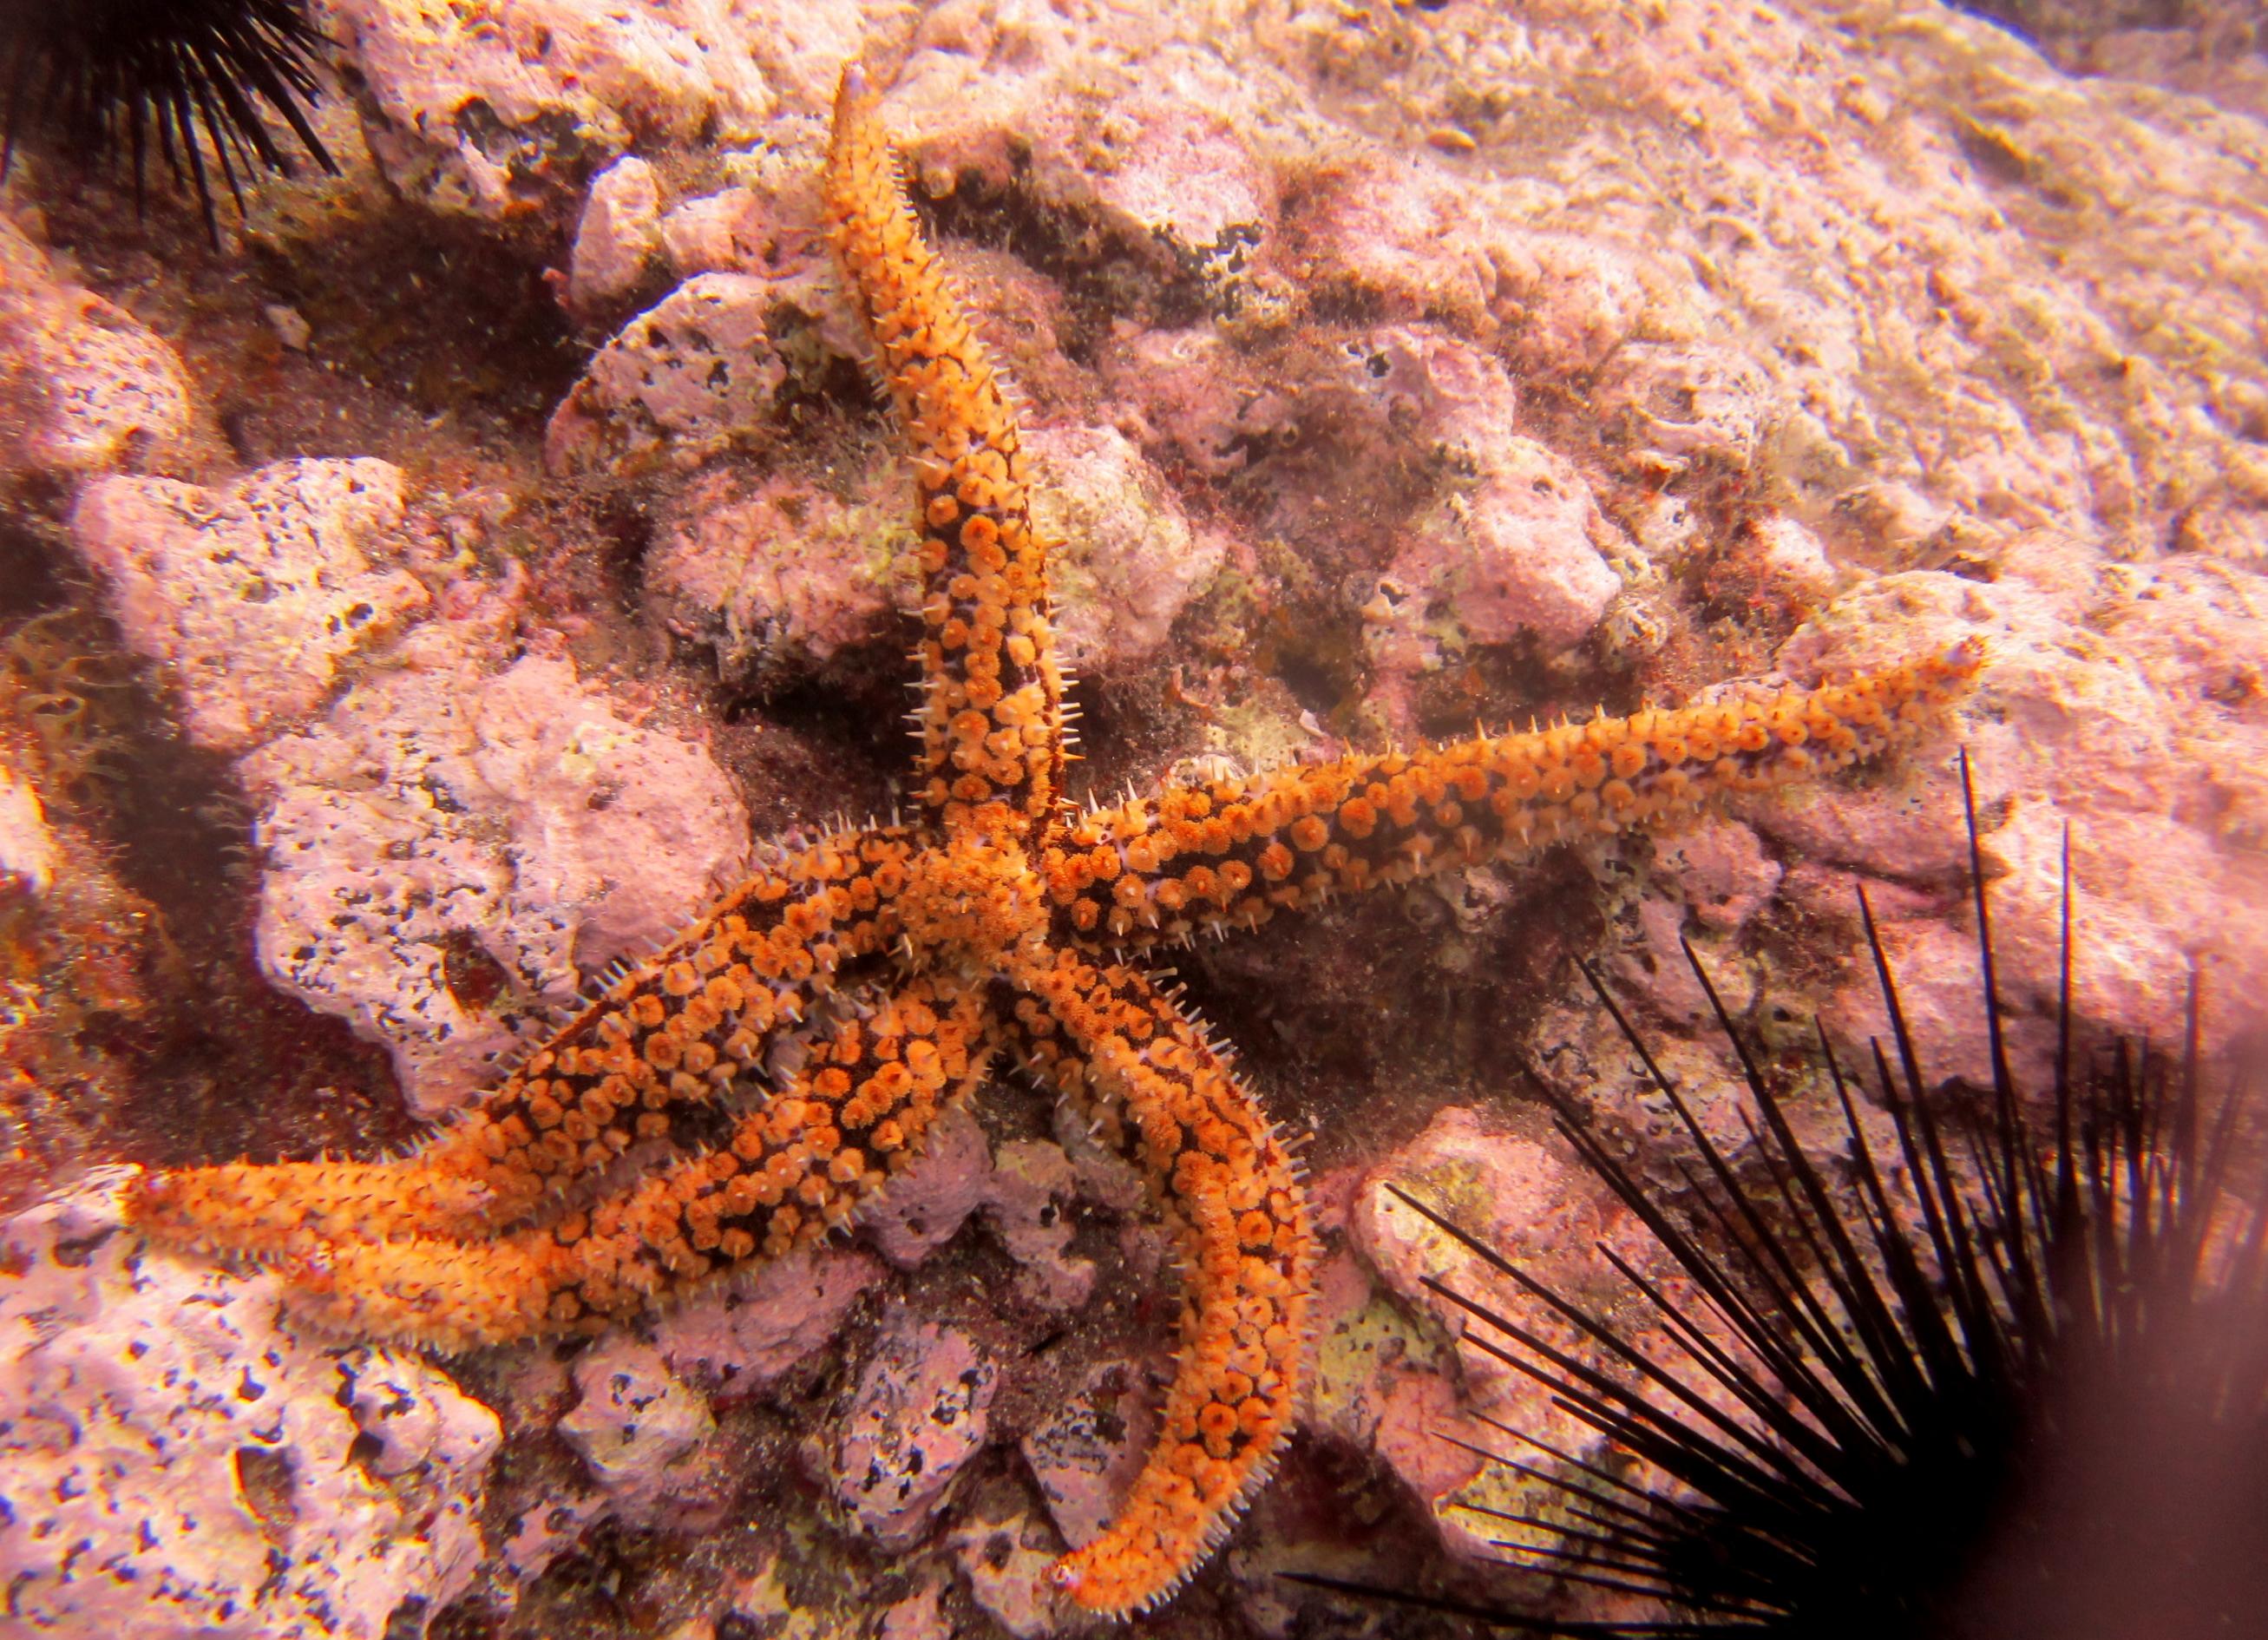 Diving-Tenerife-Aquatic-Life-Sharks-Sting-Rays-Fish (16)